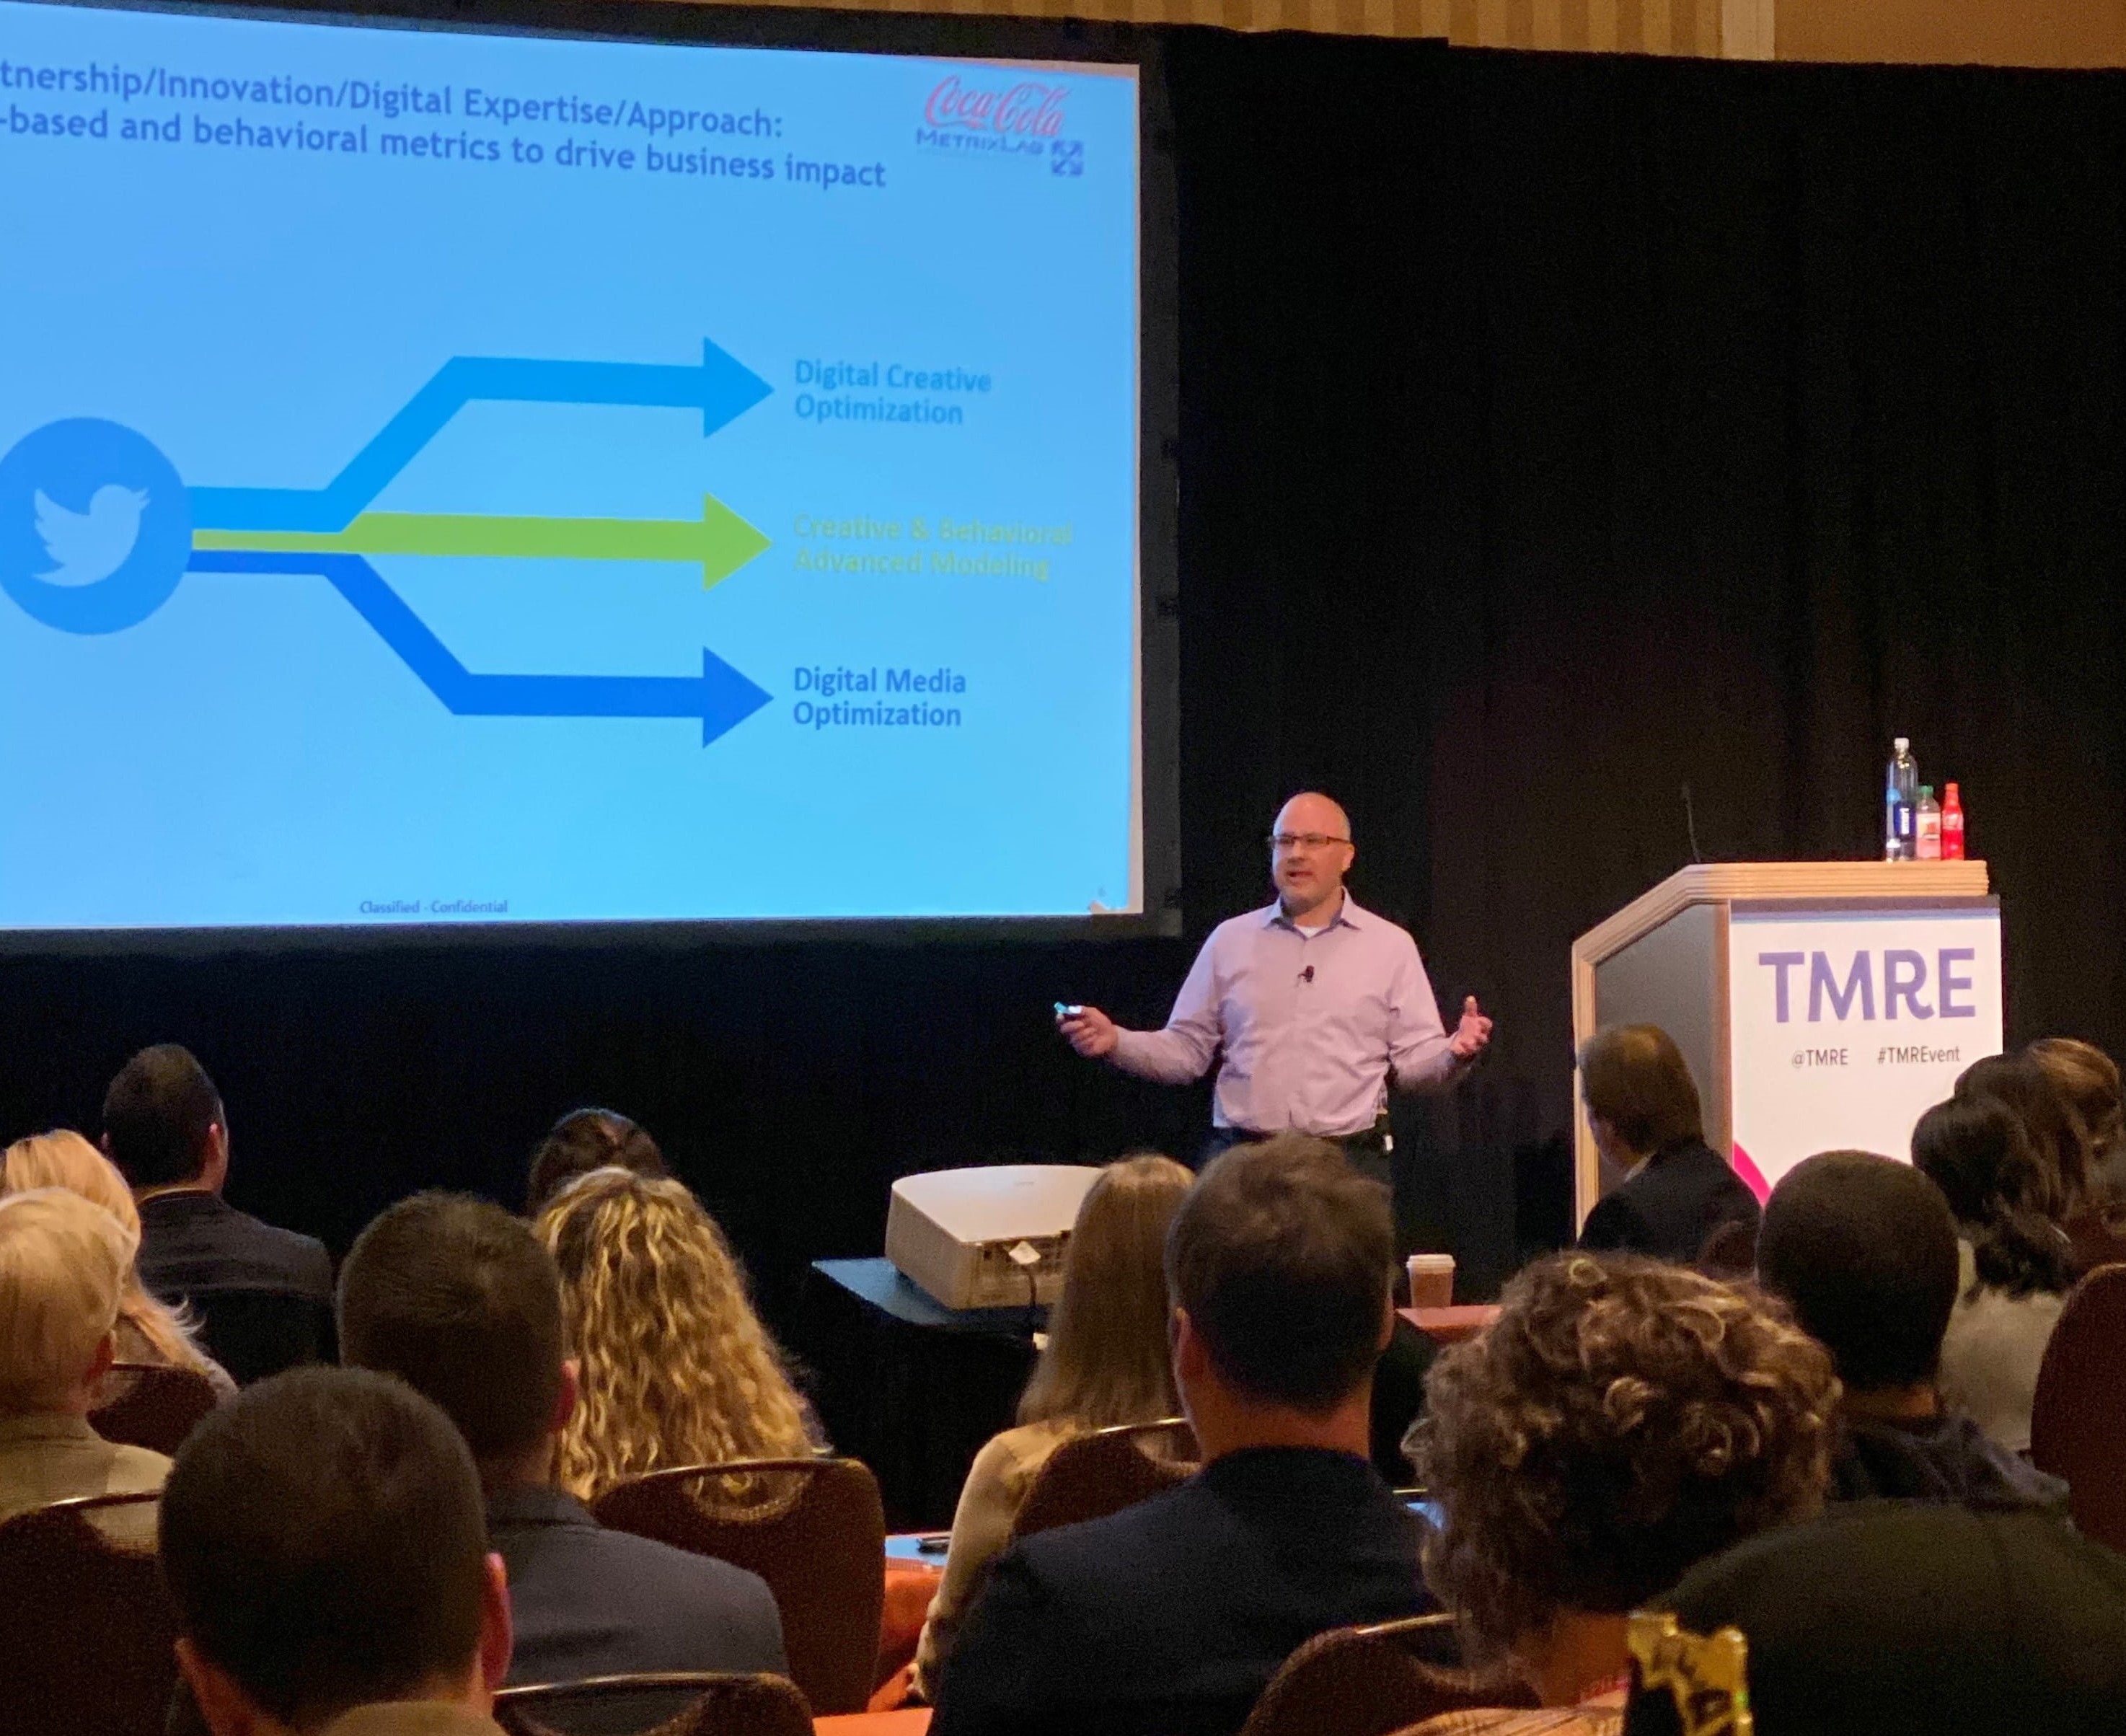 Adam Lee presenting at TMRE 2019 in Las Vegas